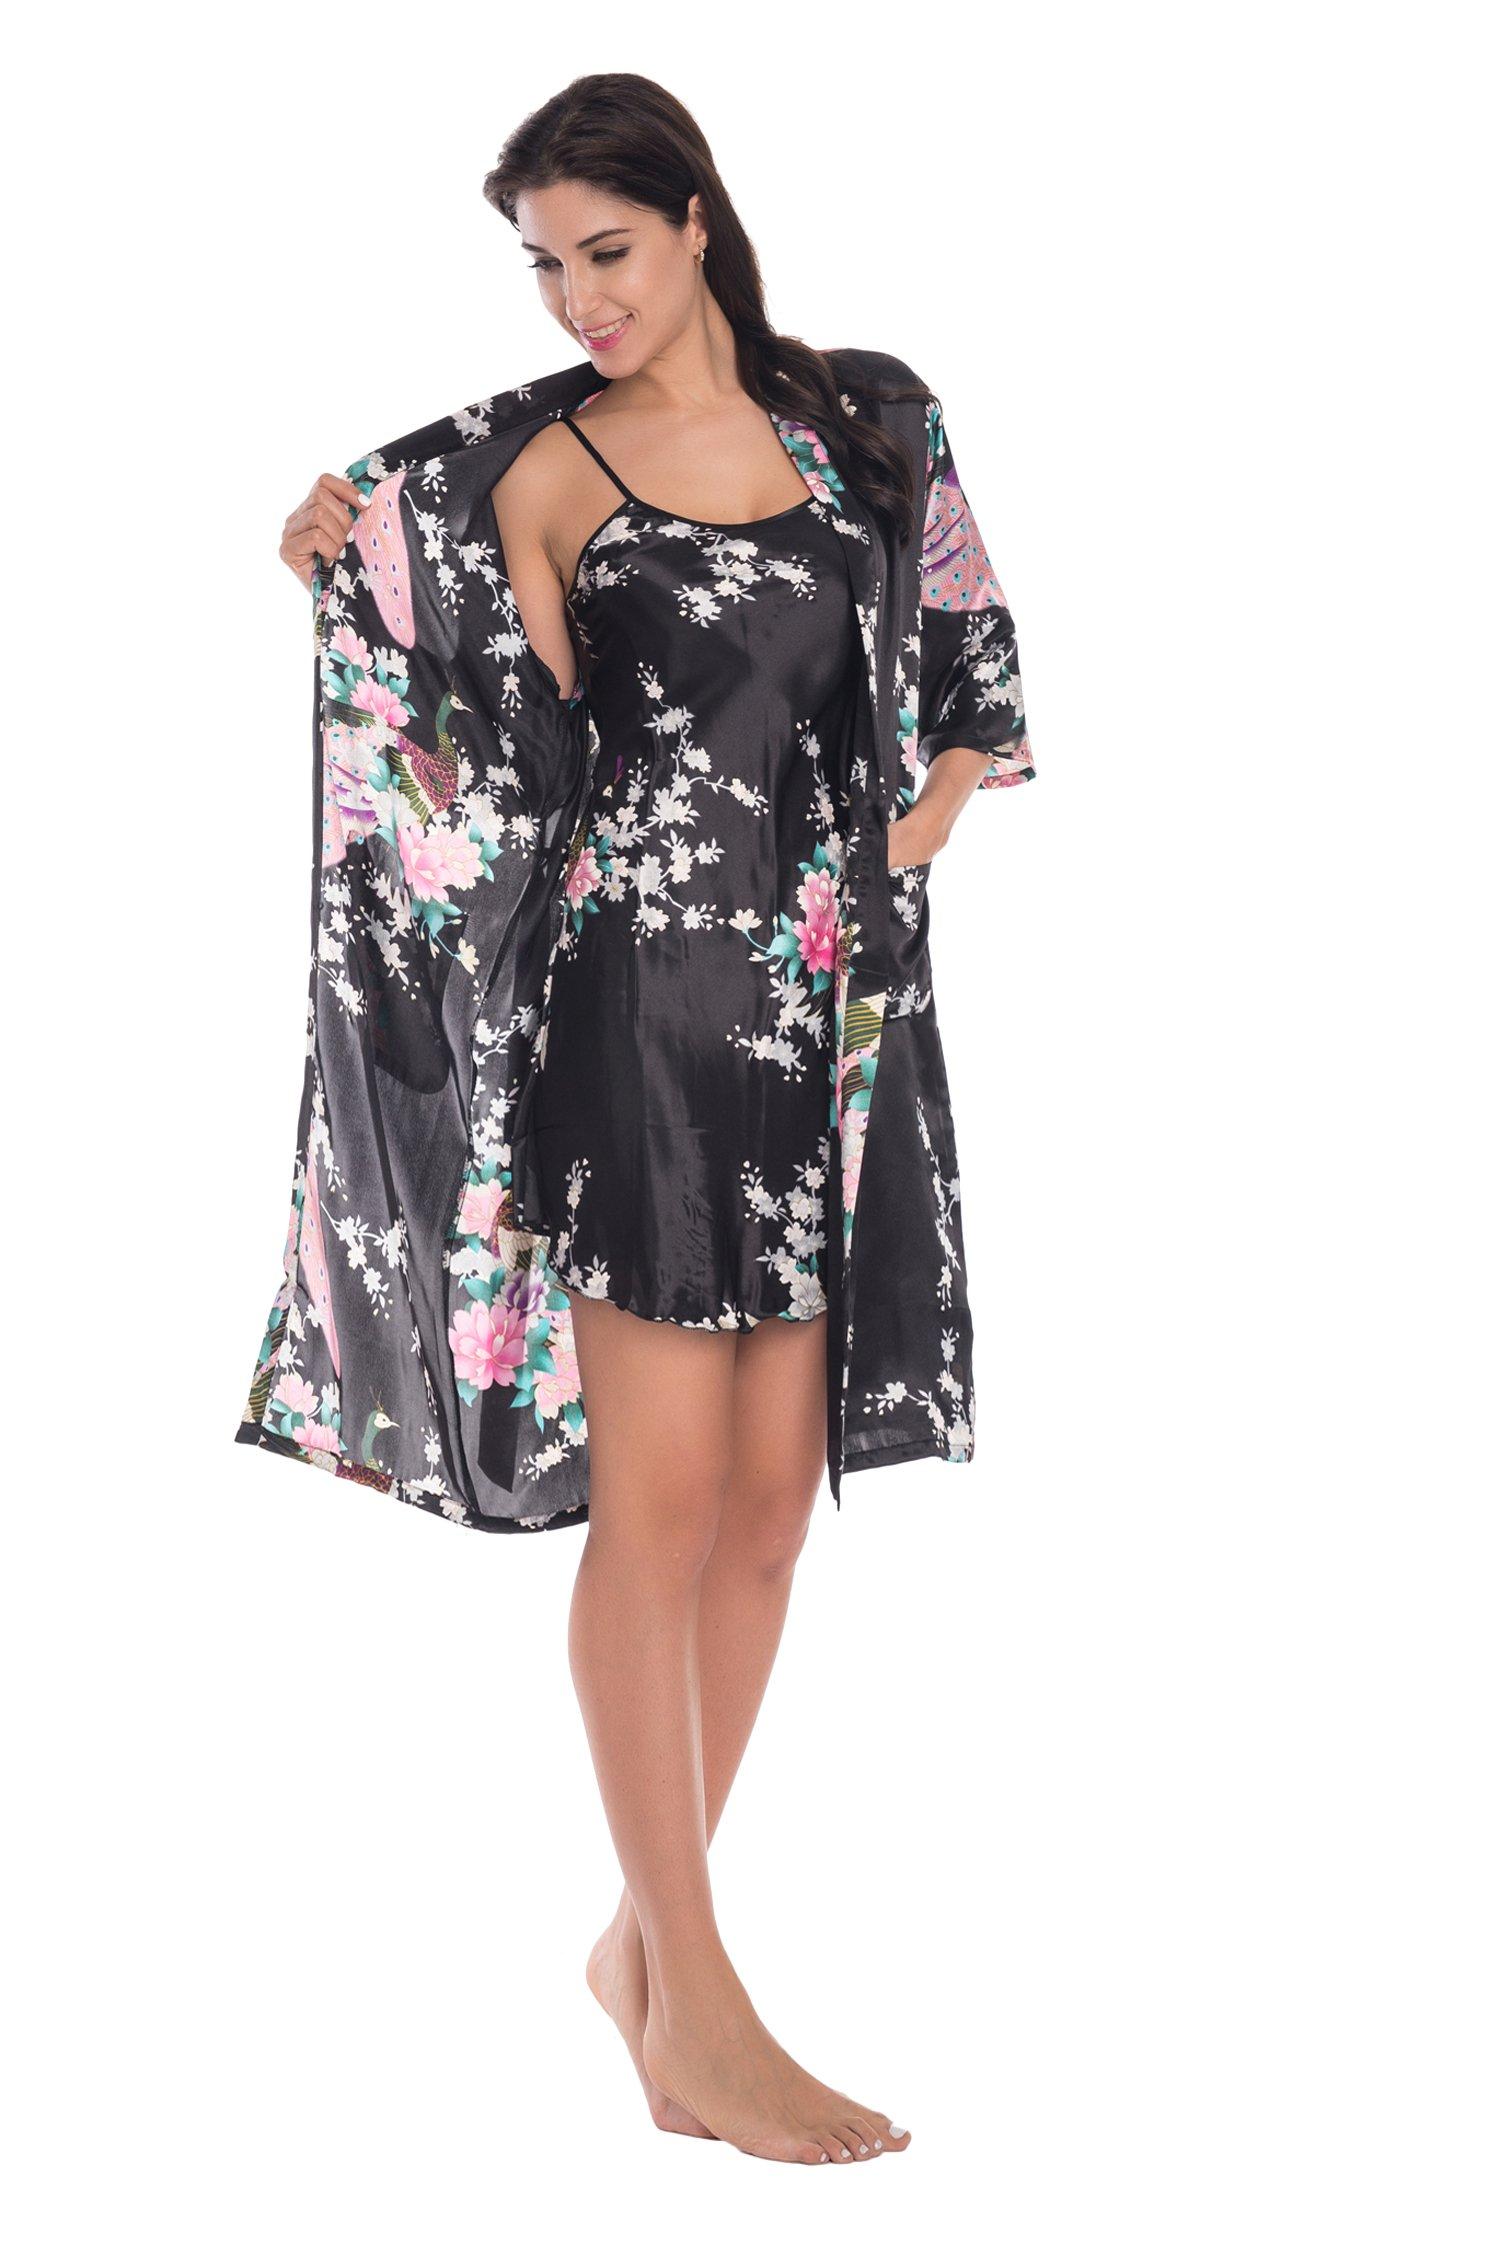 Yukata Womens Gorgeous Loungewear 2PC Set Sleepwear Camisole & Robe, Black 3XL